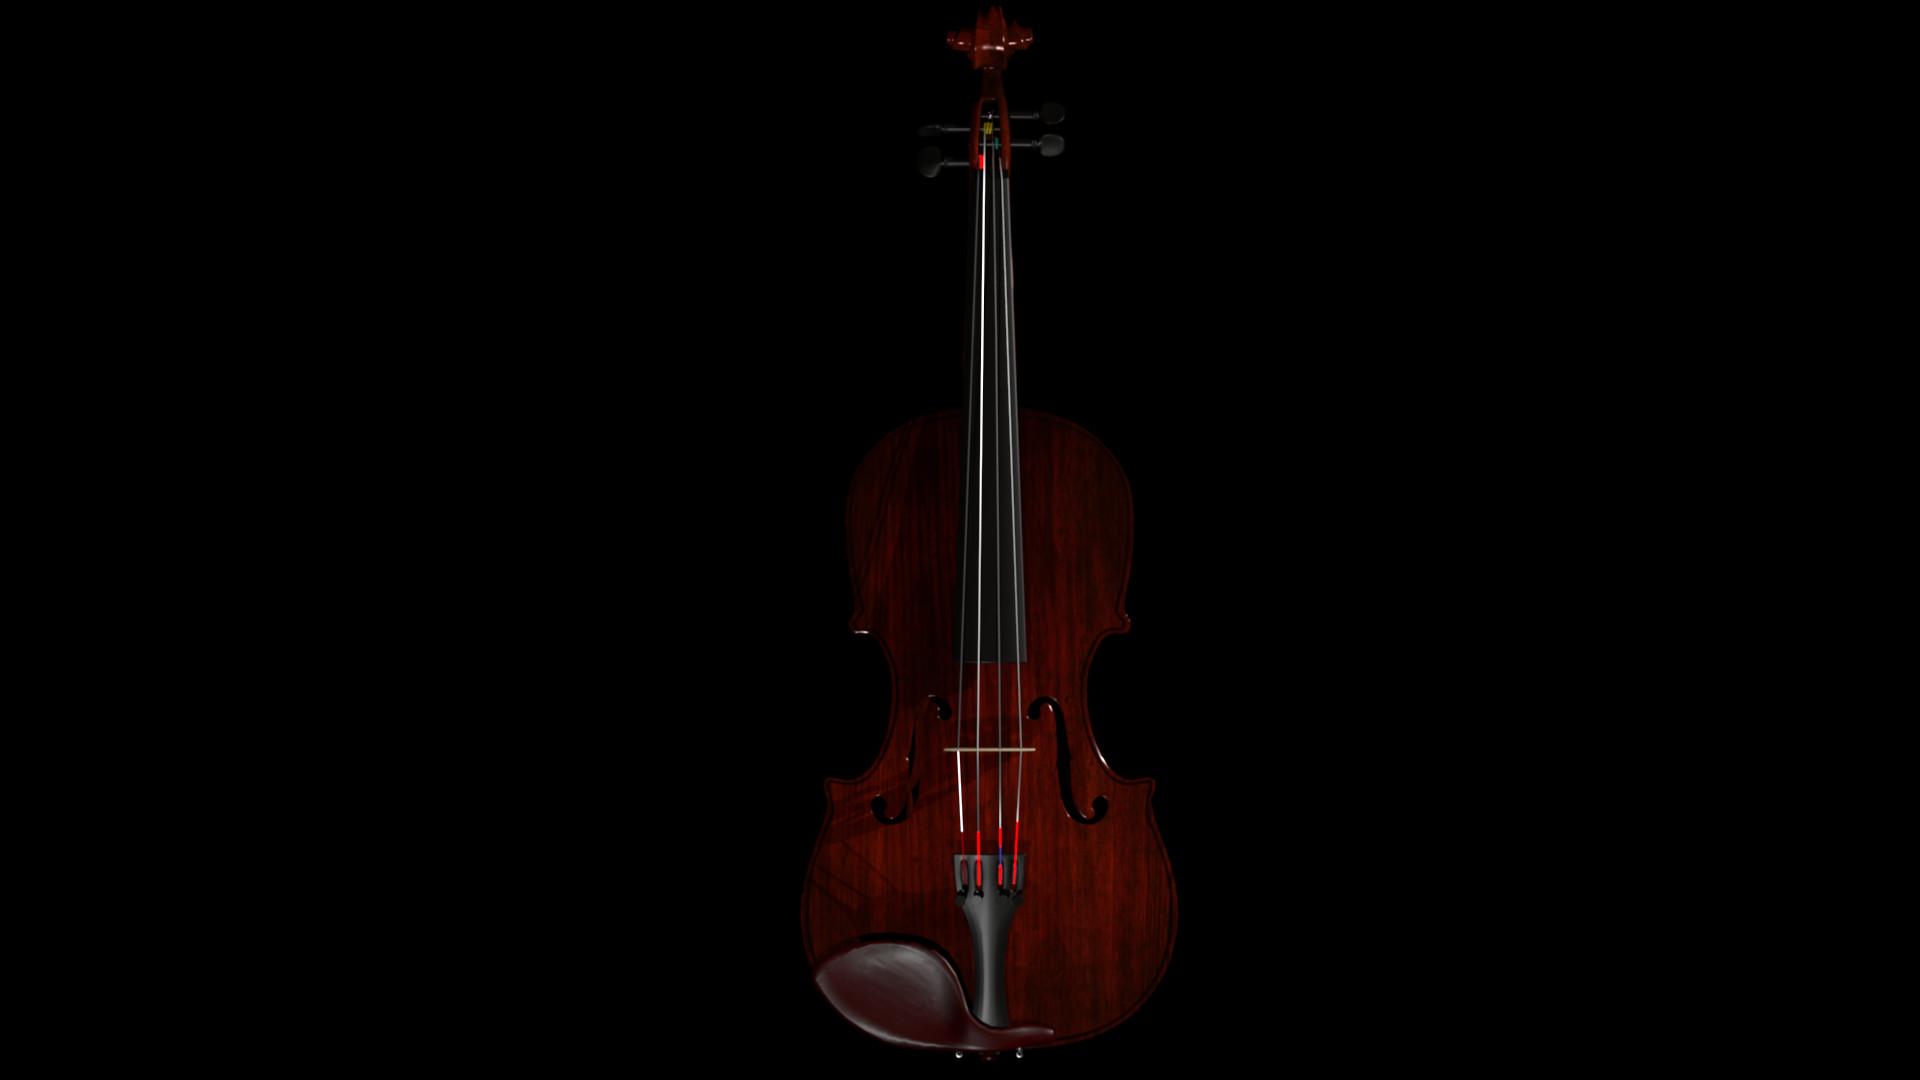 Thomas fraser violin pic3